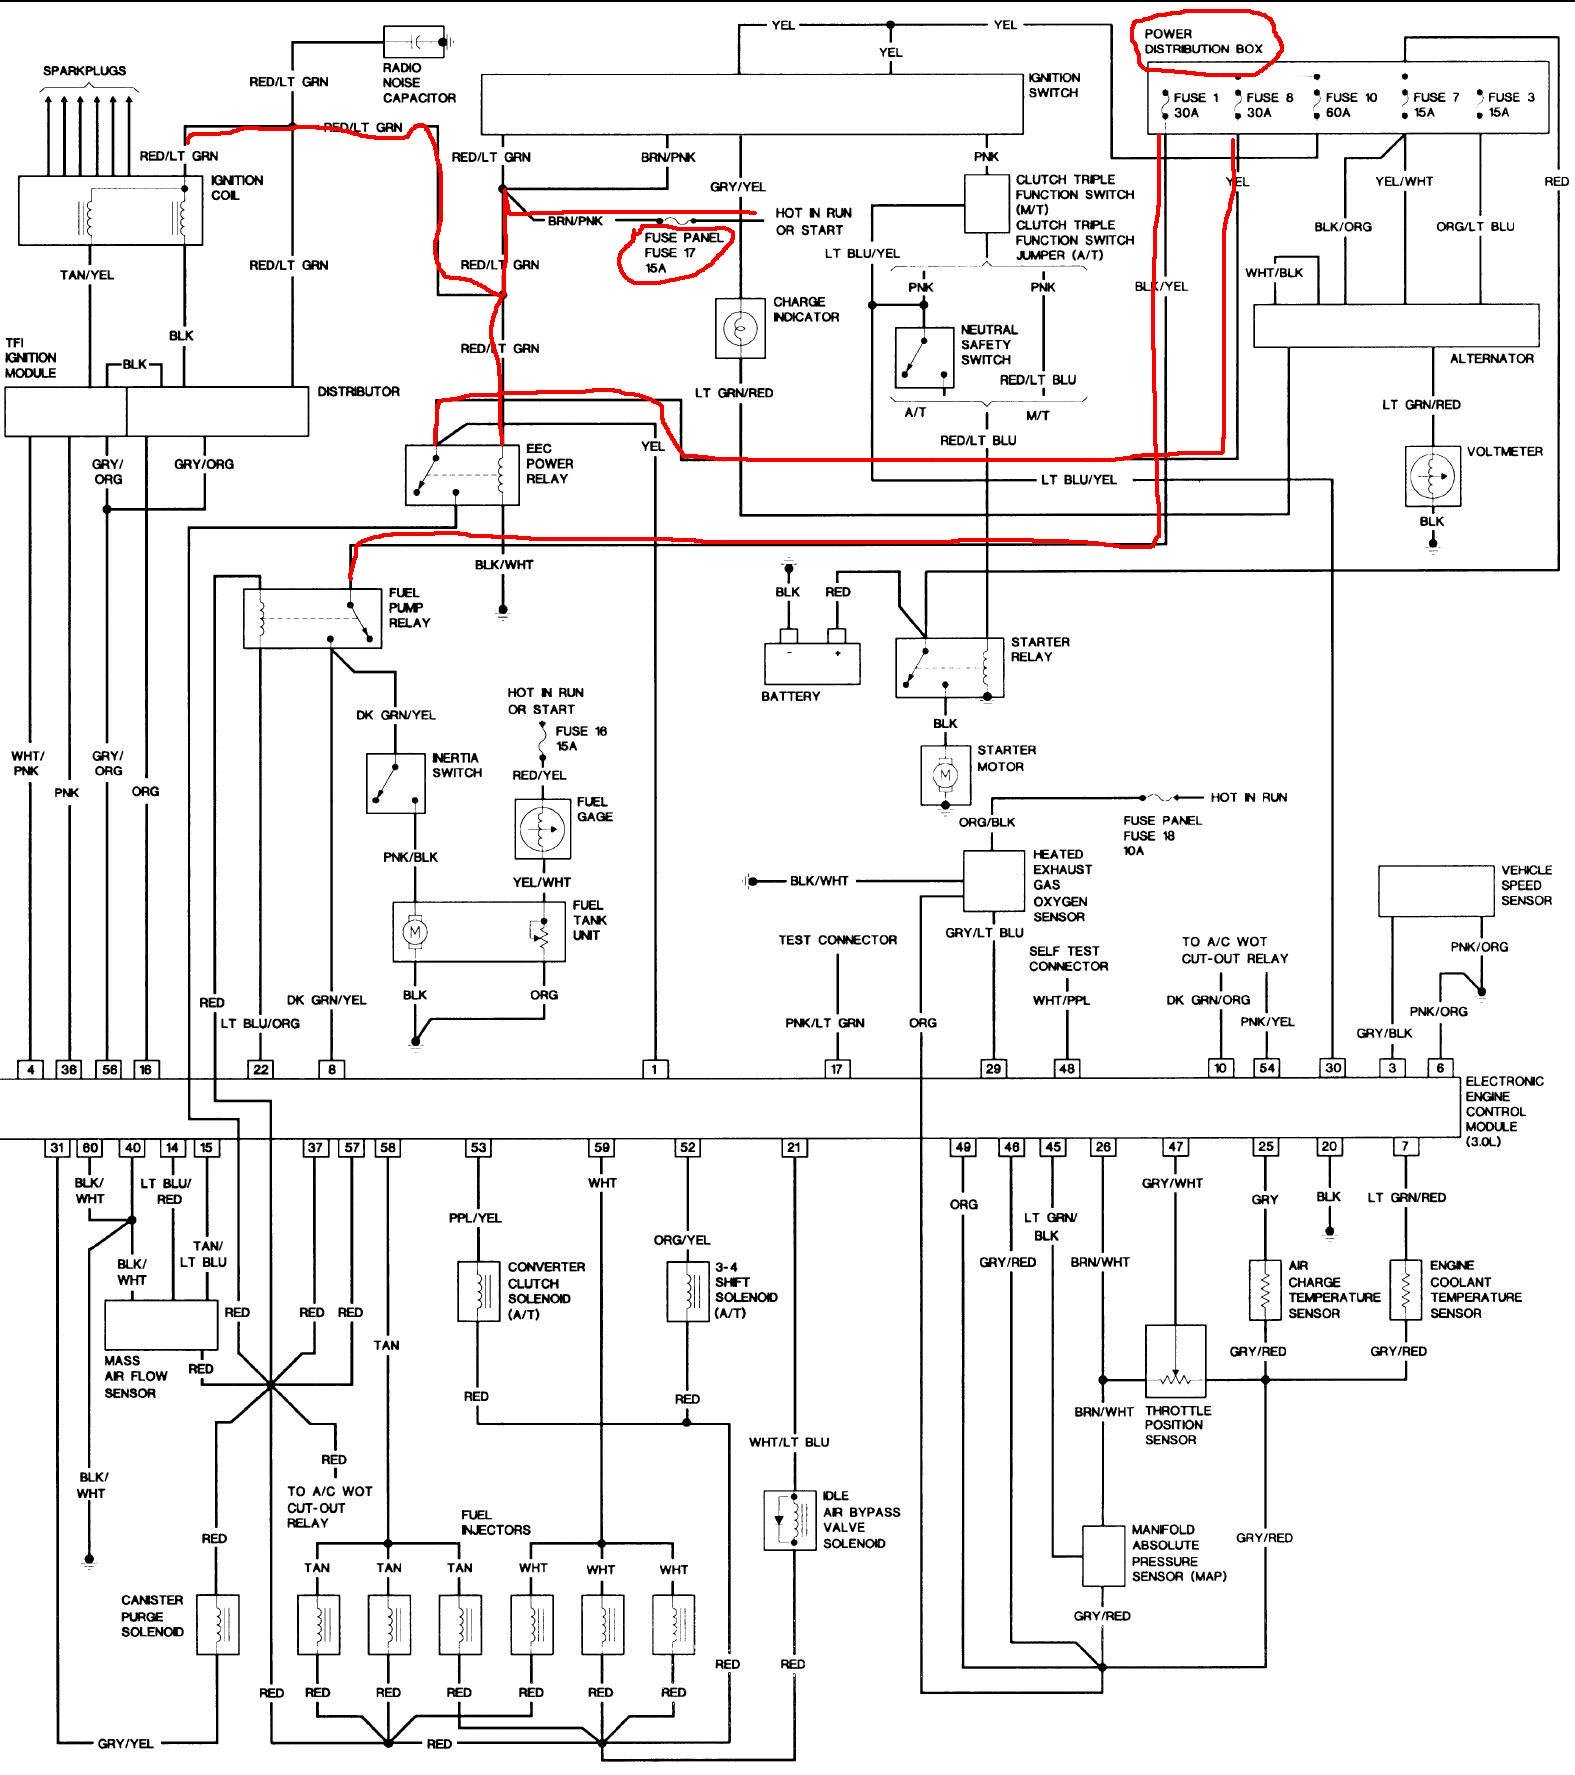 Tremendous Wiring Diagram On 91 Ranger Wiring Diagram Document Guide Wiring Cloud Licukosporaidewilluminateatxorg